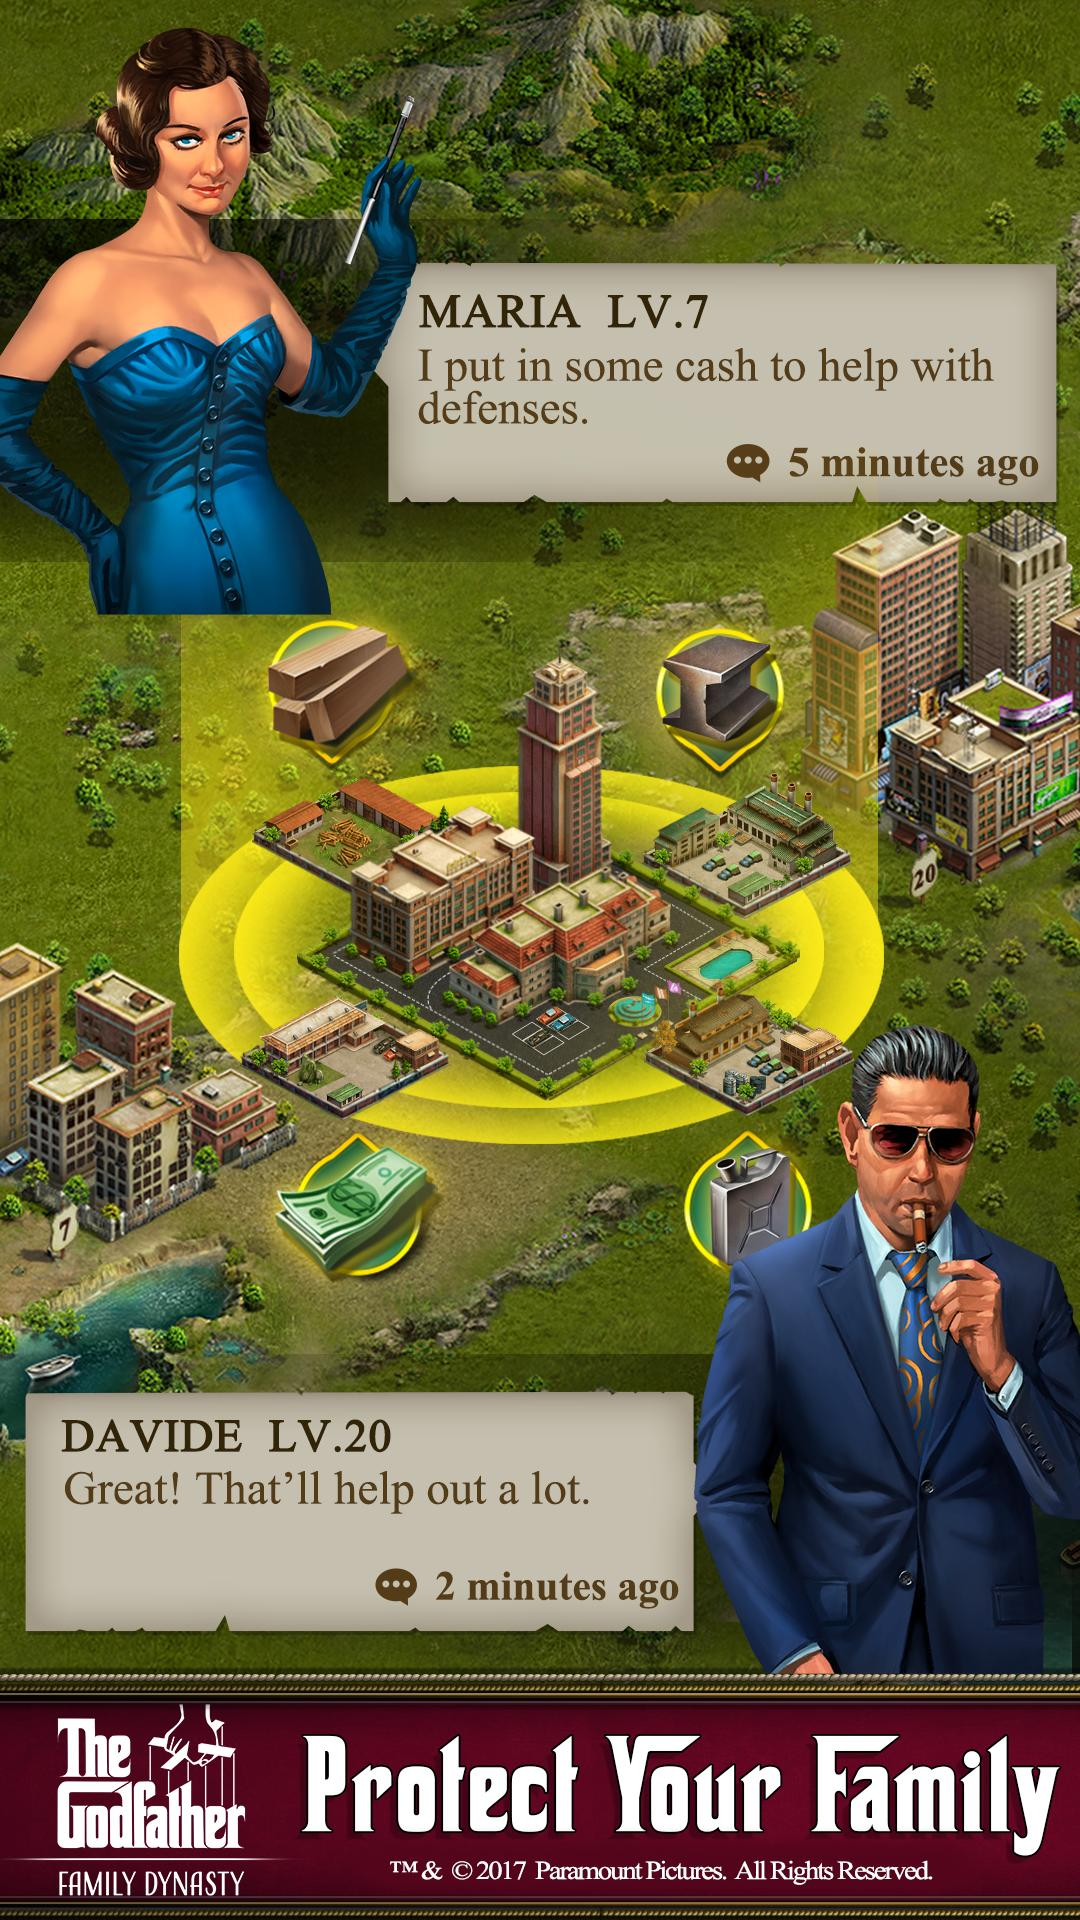 The Godfather: Family Dynasty 1.86 Screenshot 4